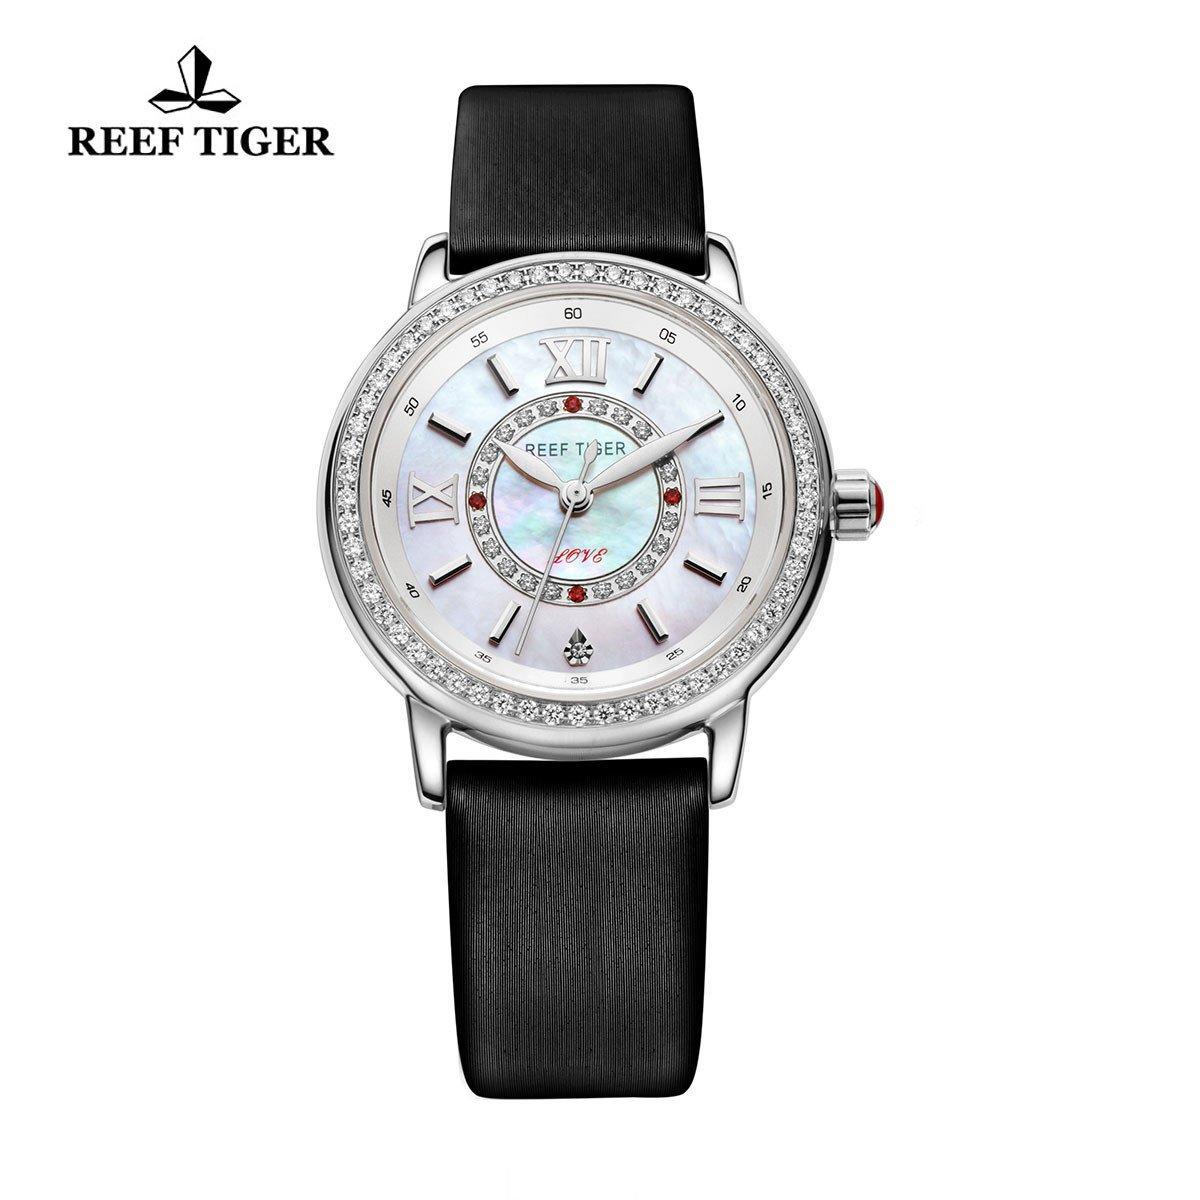 Đồng Hồ Reef Tiger RGA1563-YWWD